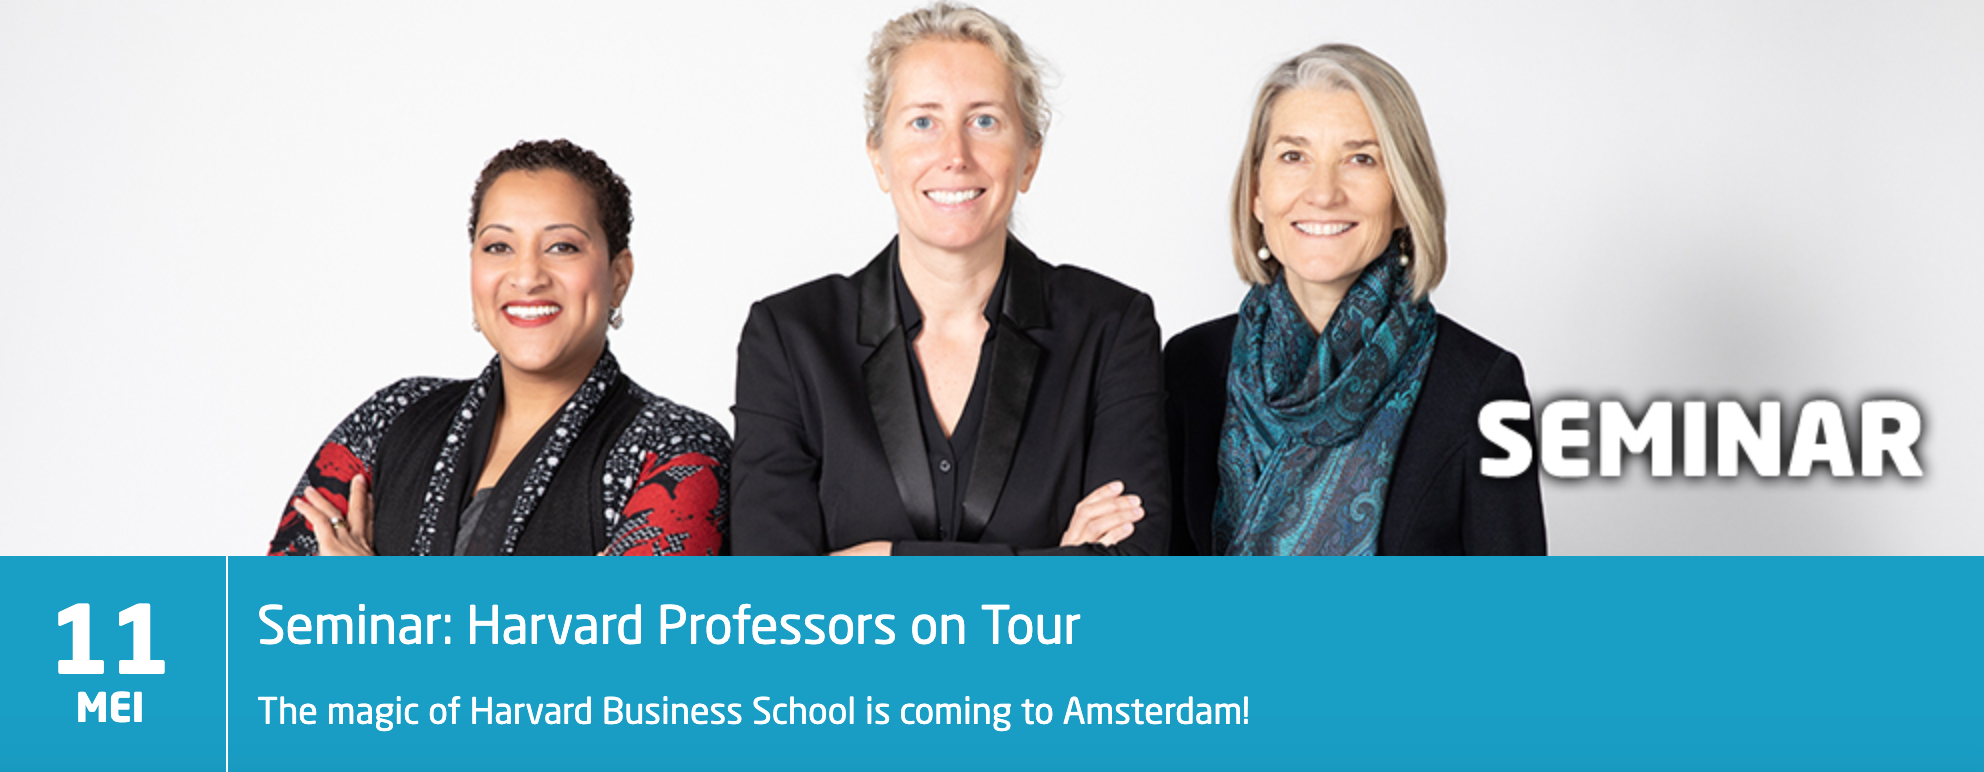 Seminar - Harvard Professors on Tour